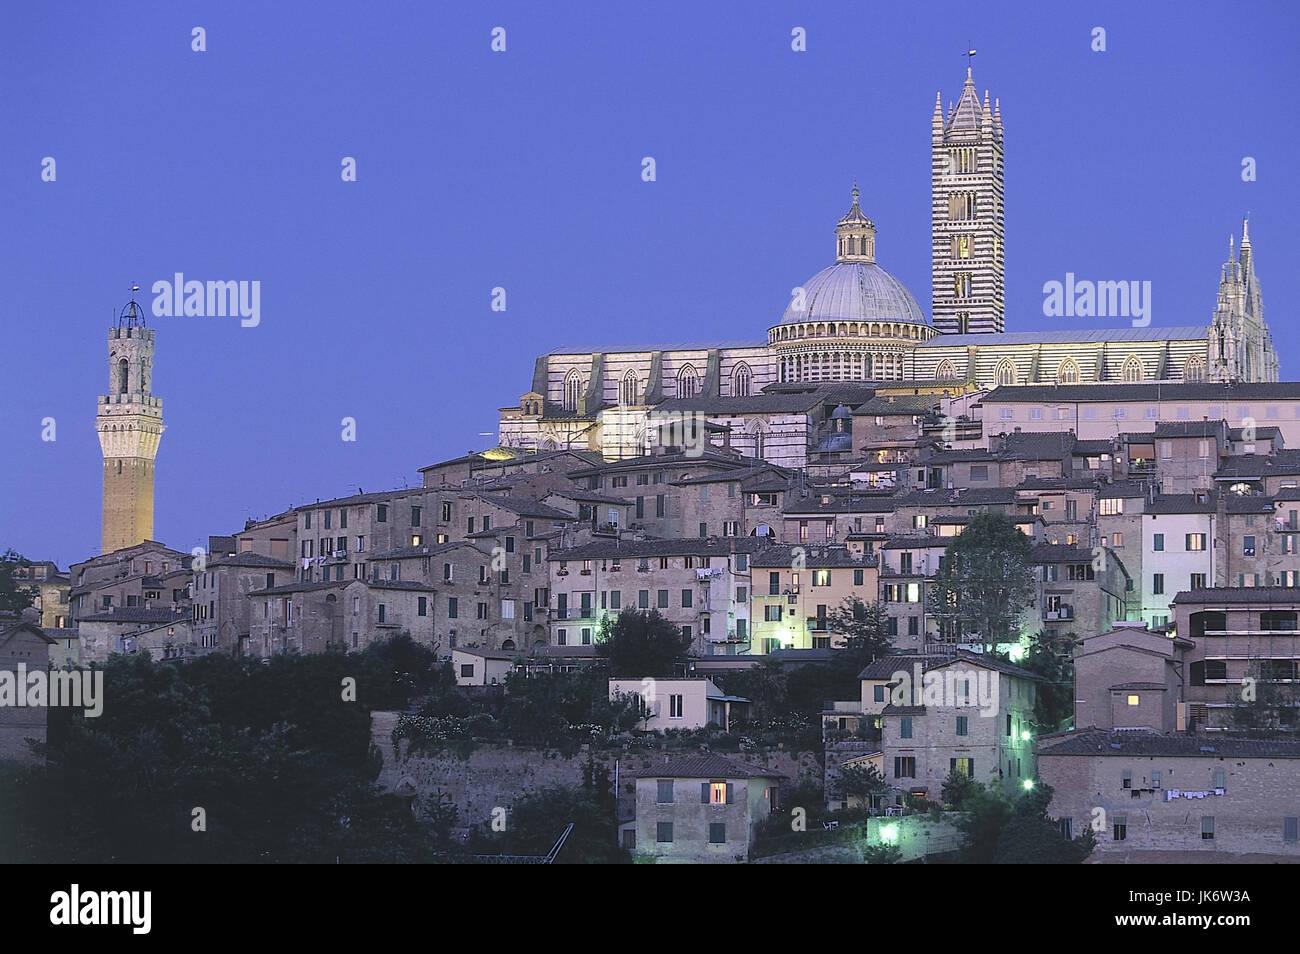 Italien, Toskana, Siena, Stadtansicht, Dom, 14 Jh., Palazzo Pubblico, Dämmerung Europa, Südeuropa, Stadt, - Stock Image